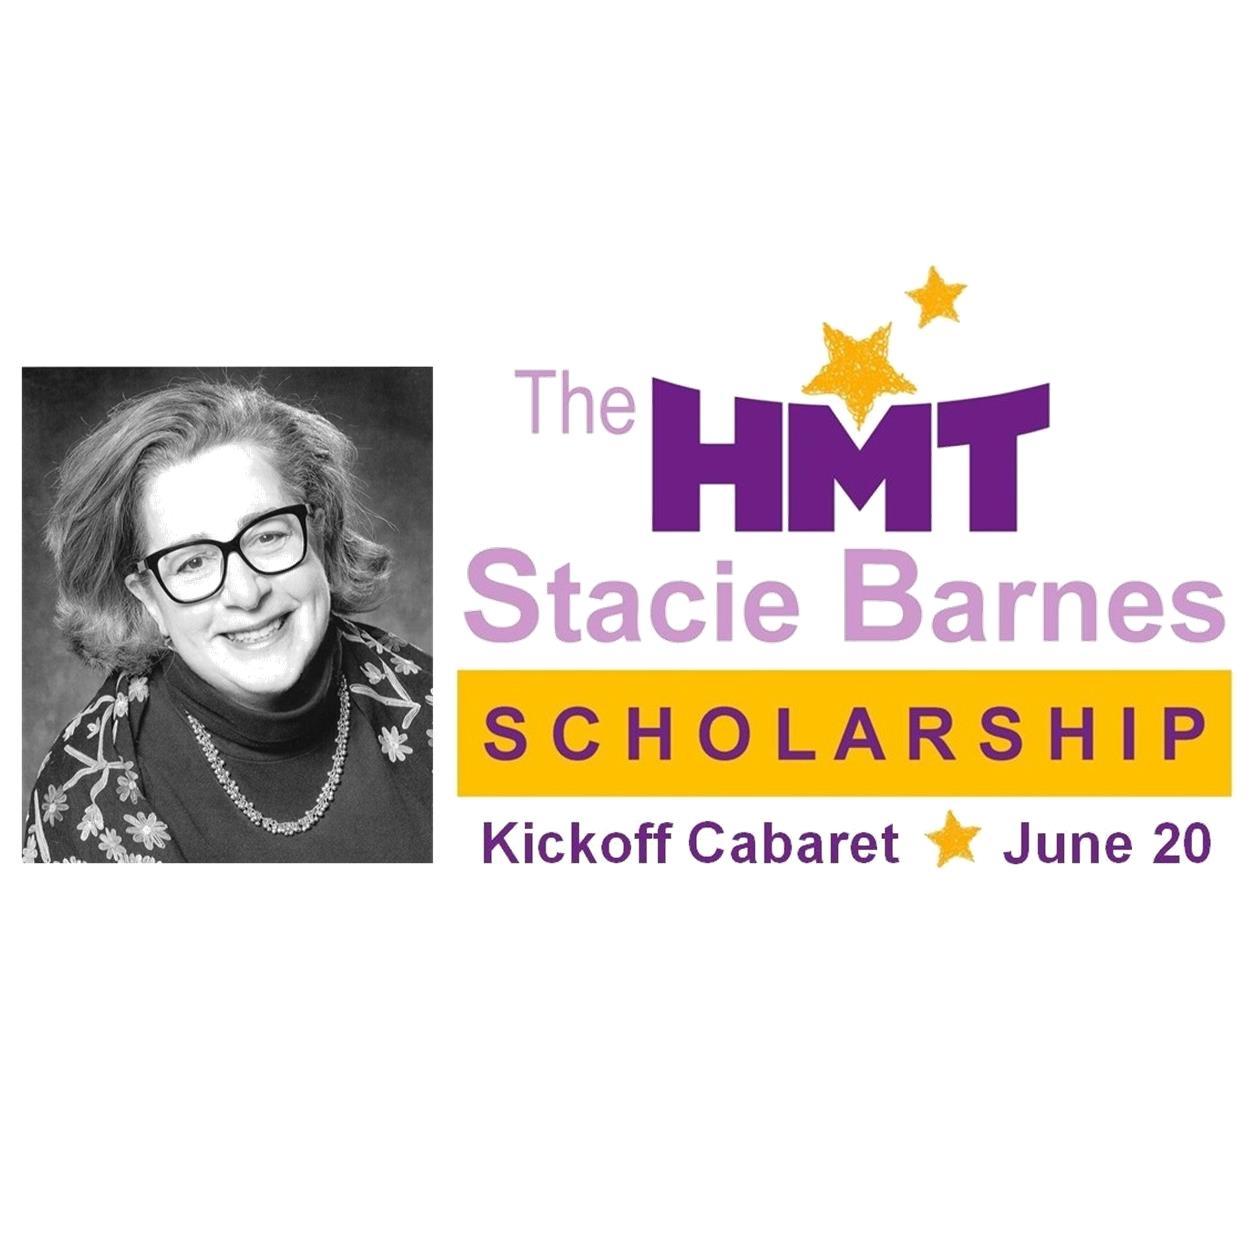 The HMT Stacie Barnes Scholarship Kickoff Cabaret